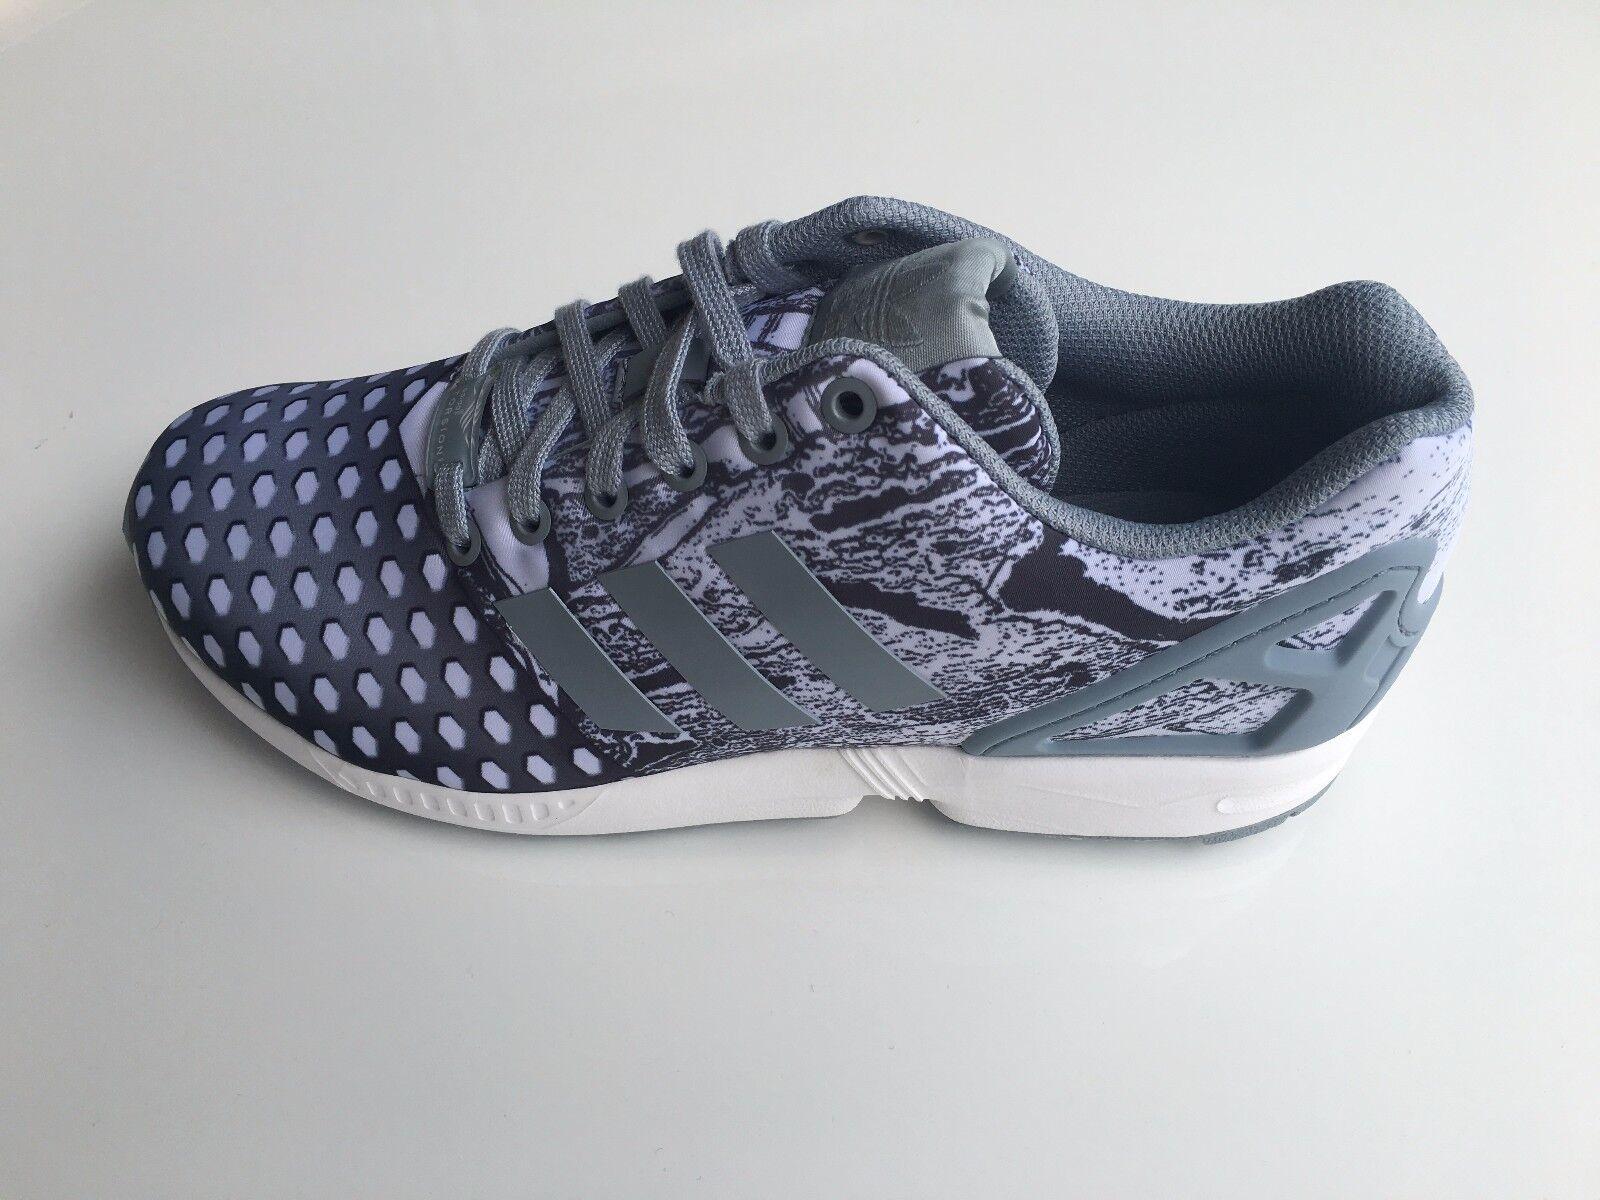 adc0d8408 Originals ZX Flux BB1834 LGTGRE Men s Size 8.5 FTWWHT Adidas ...